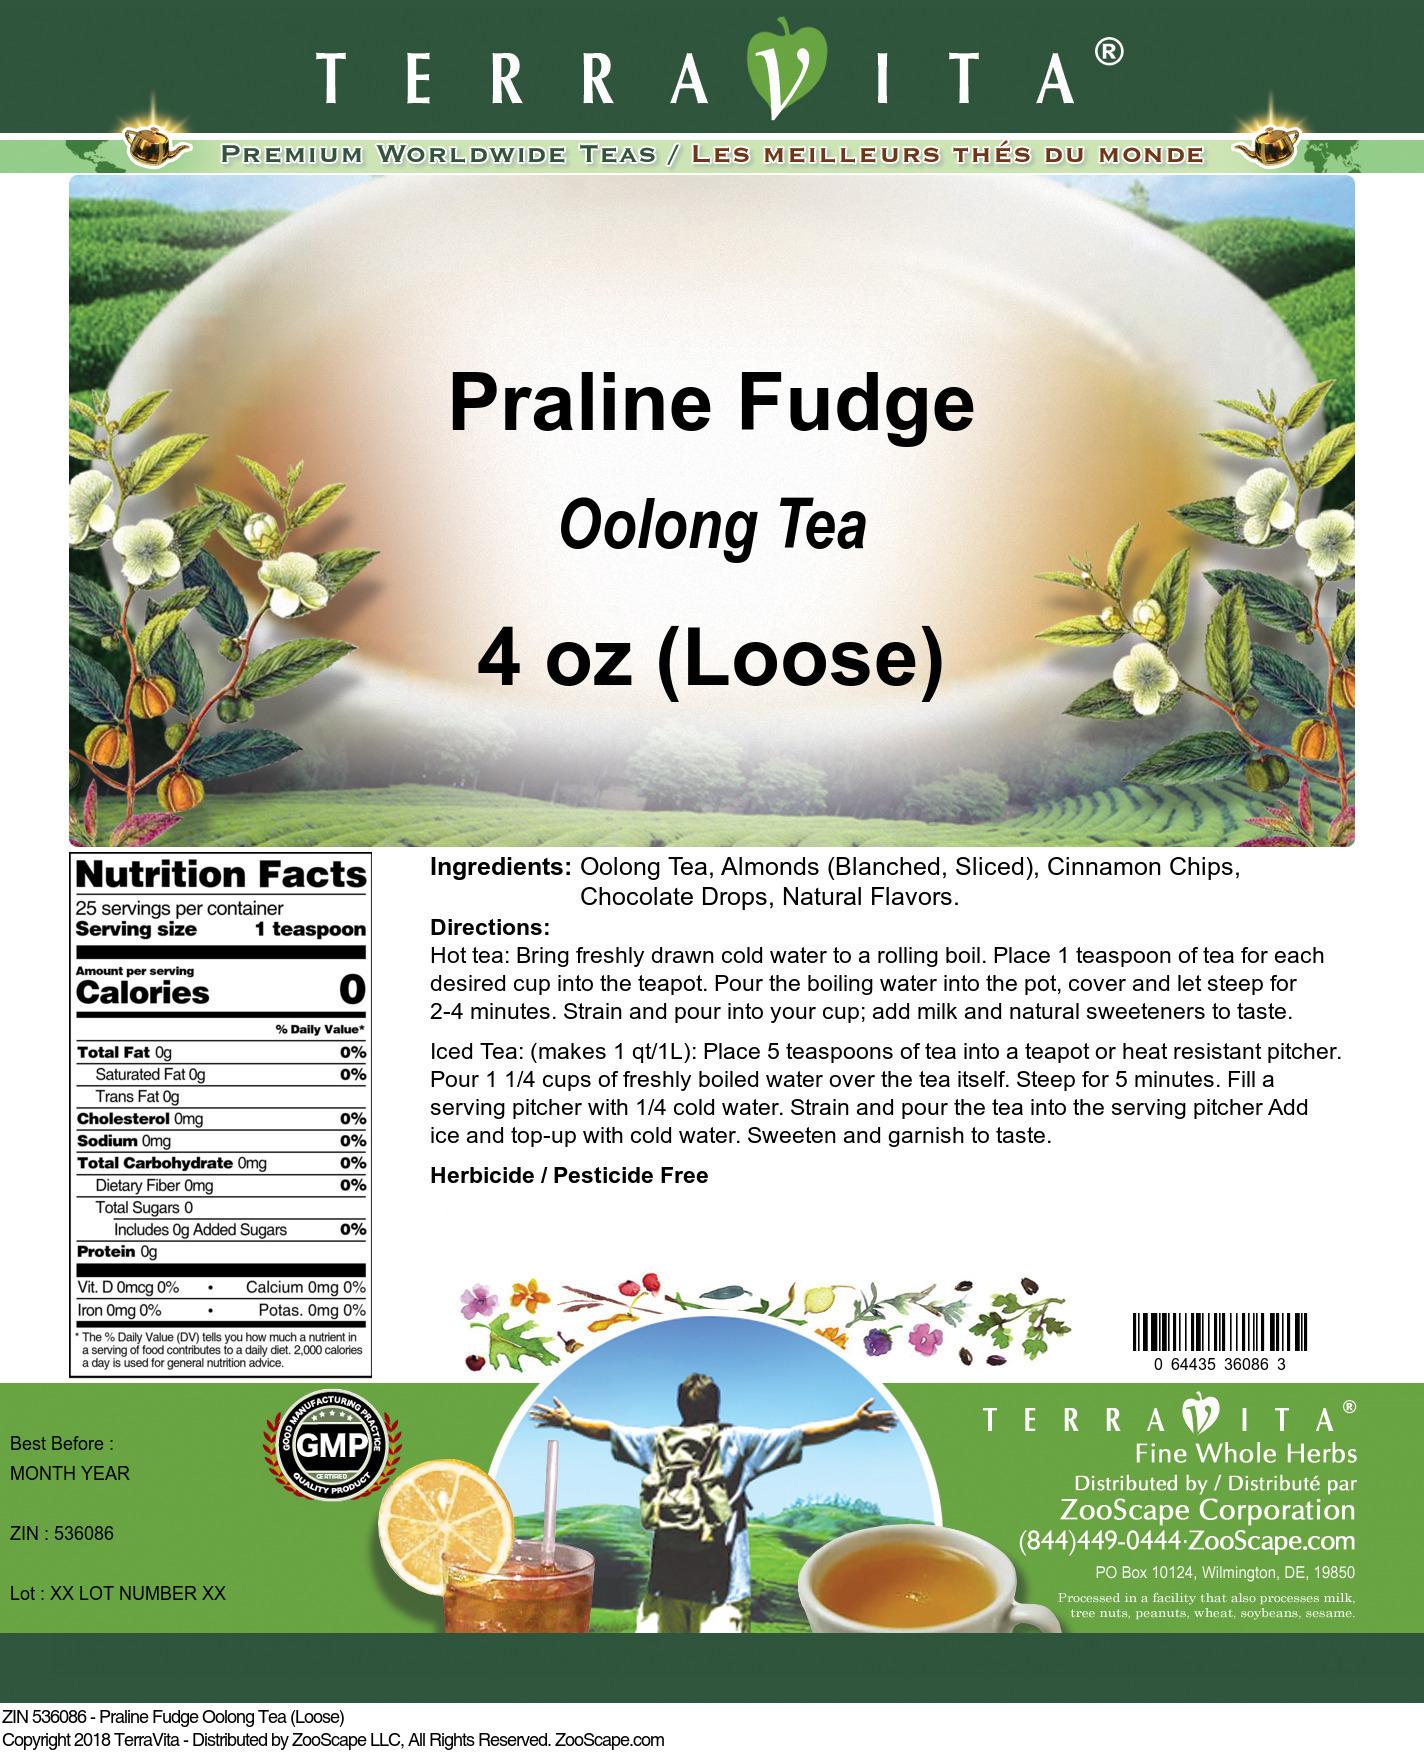 Praline Fudge Oolong Tea (Loose)